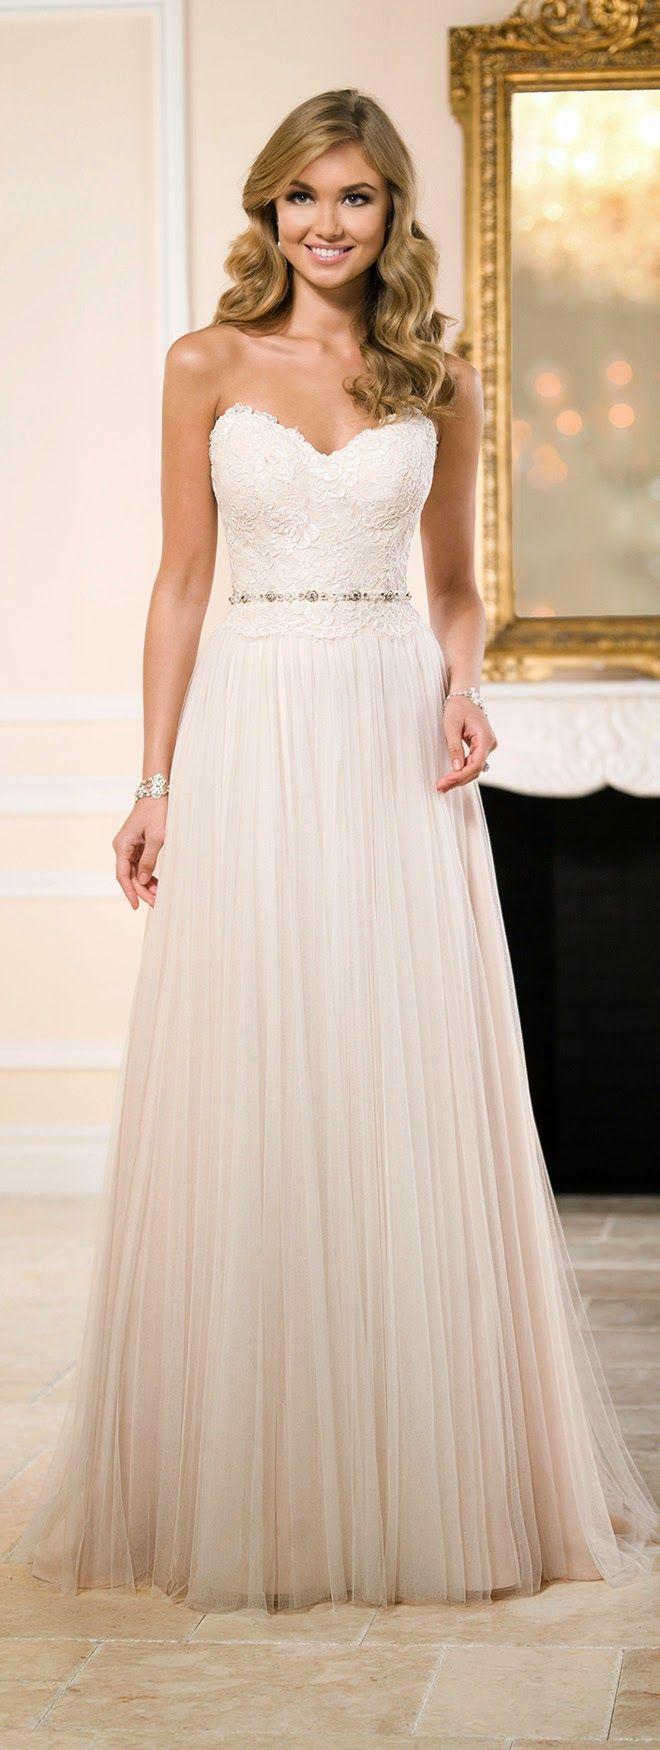 Stella York Fall 2015 Bridal Collection | Stella york, Bridal ...